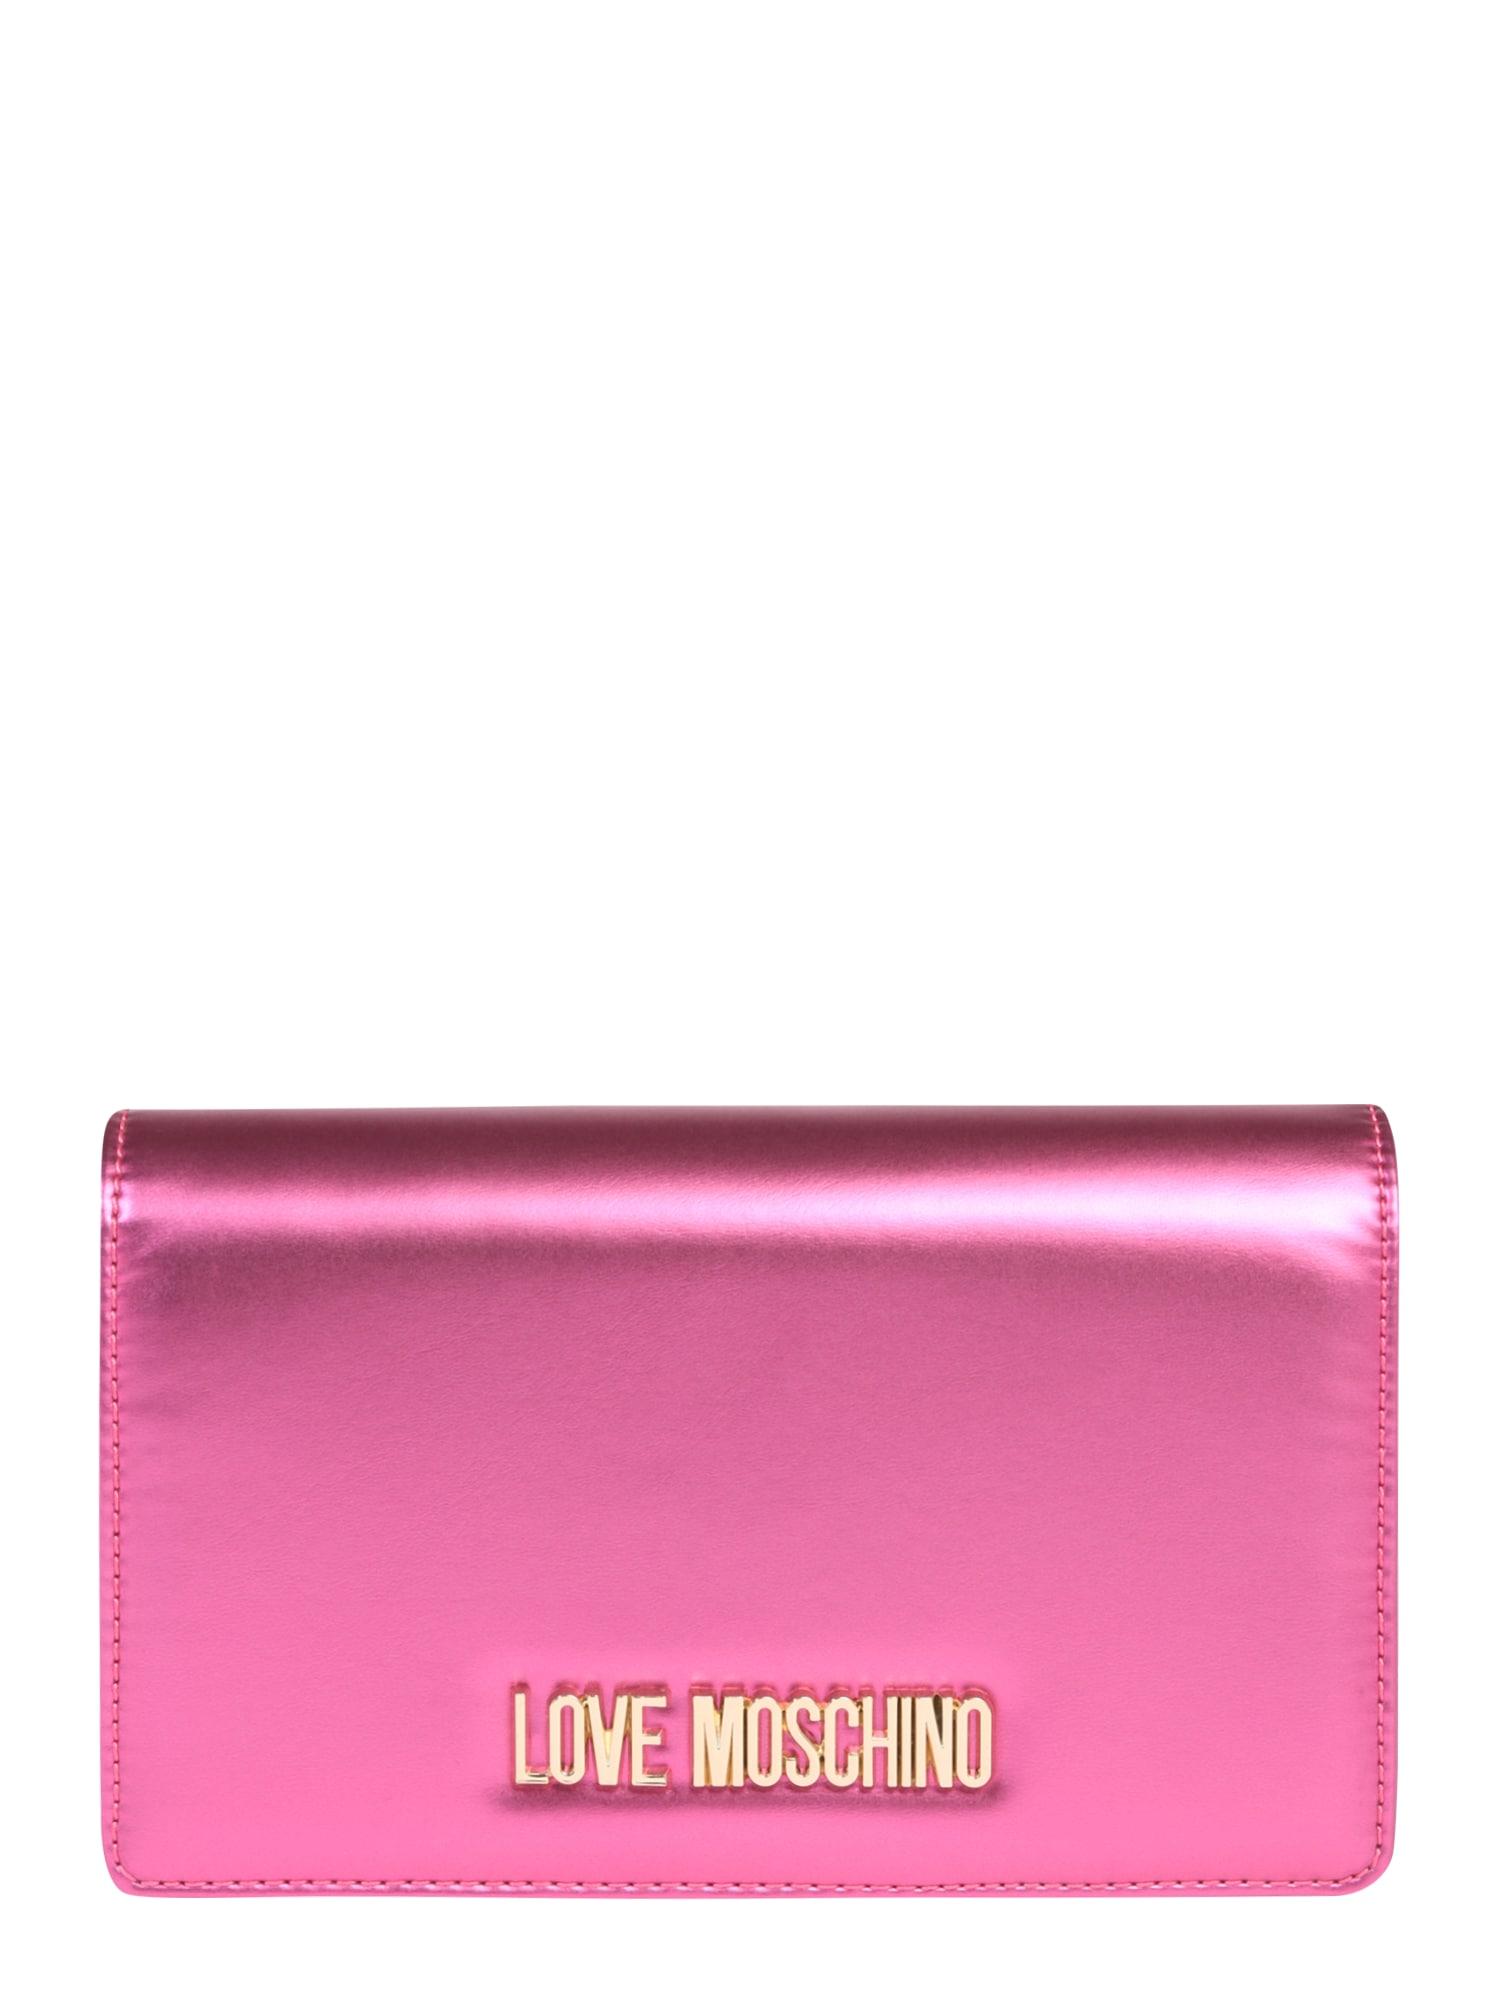 Taška přes rameno BORSA METALLIC PU NERO fuchsiová Love Moschino